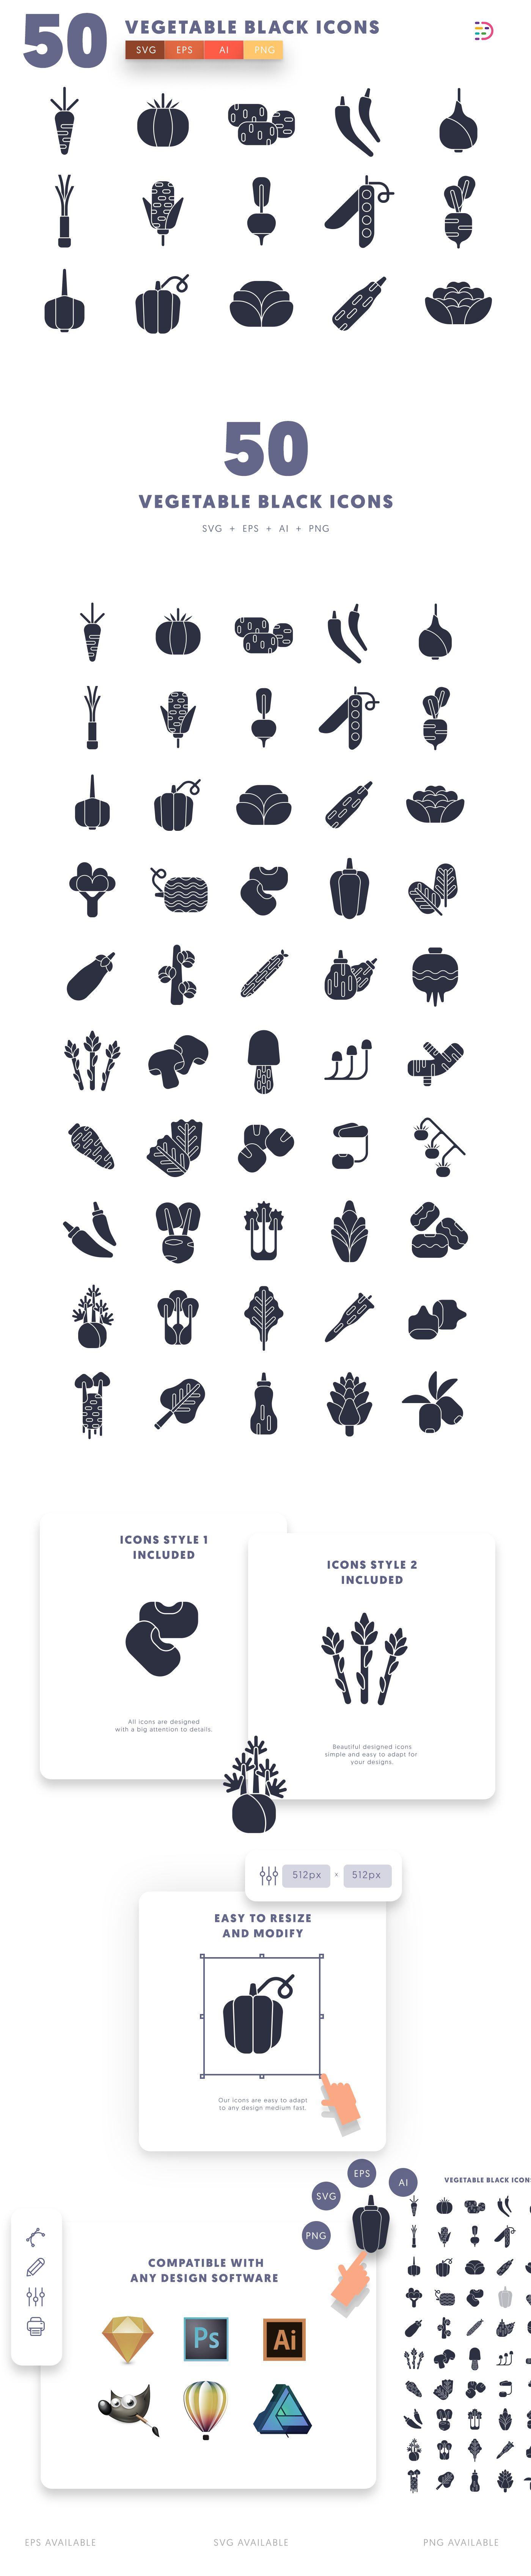 Vegetable Black icons info graphic